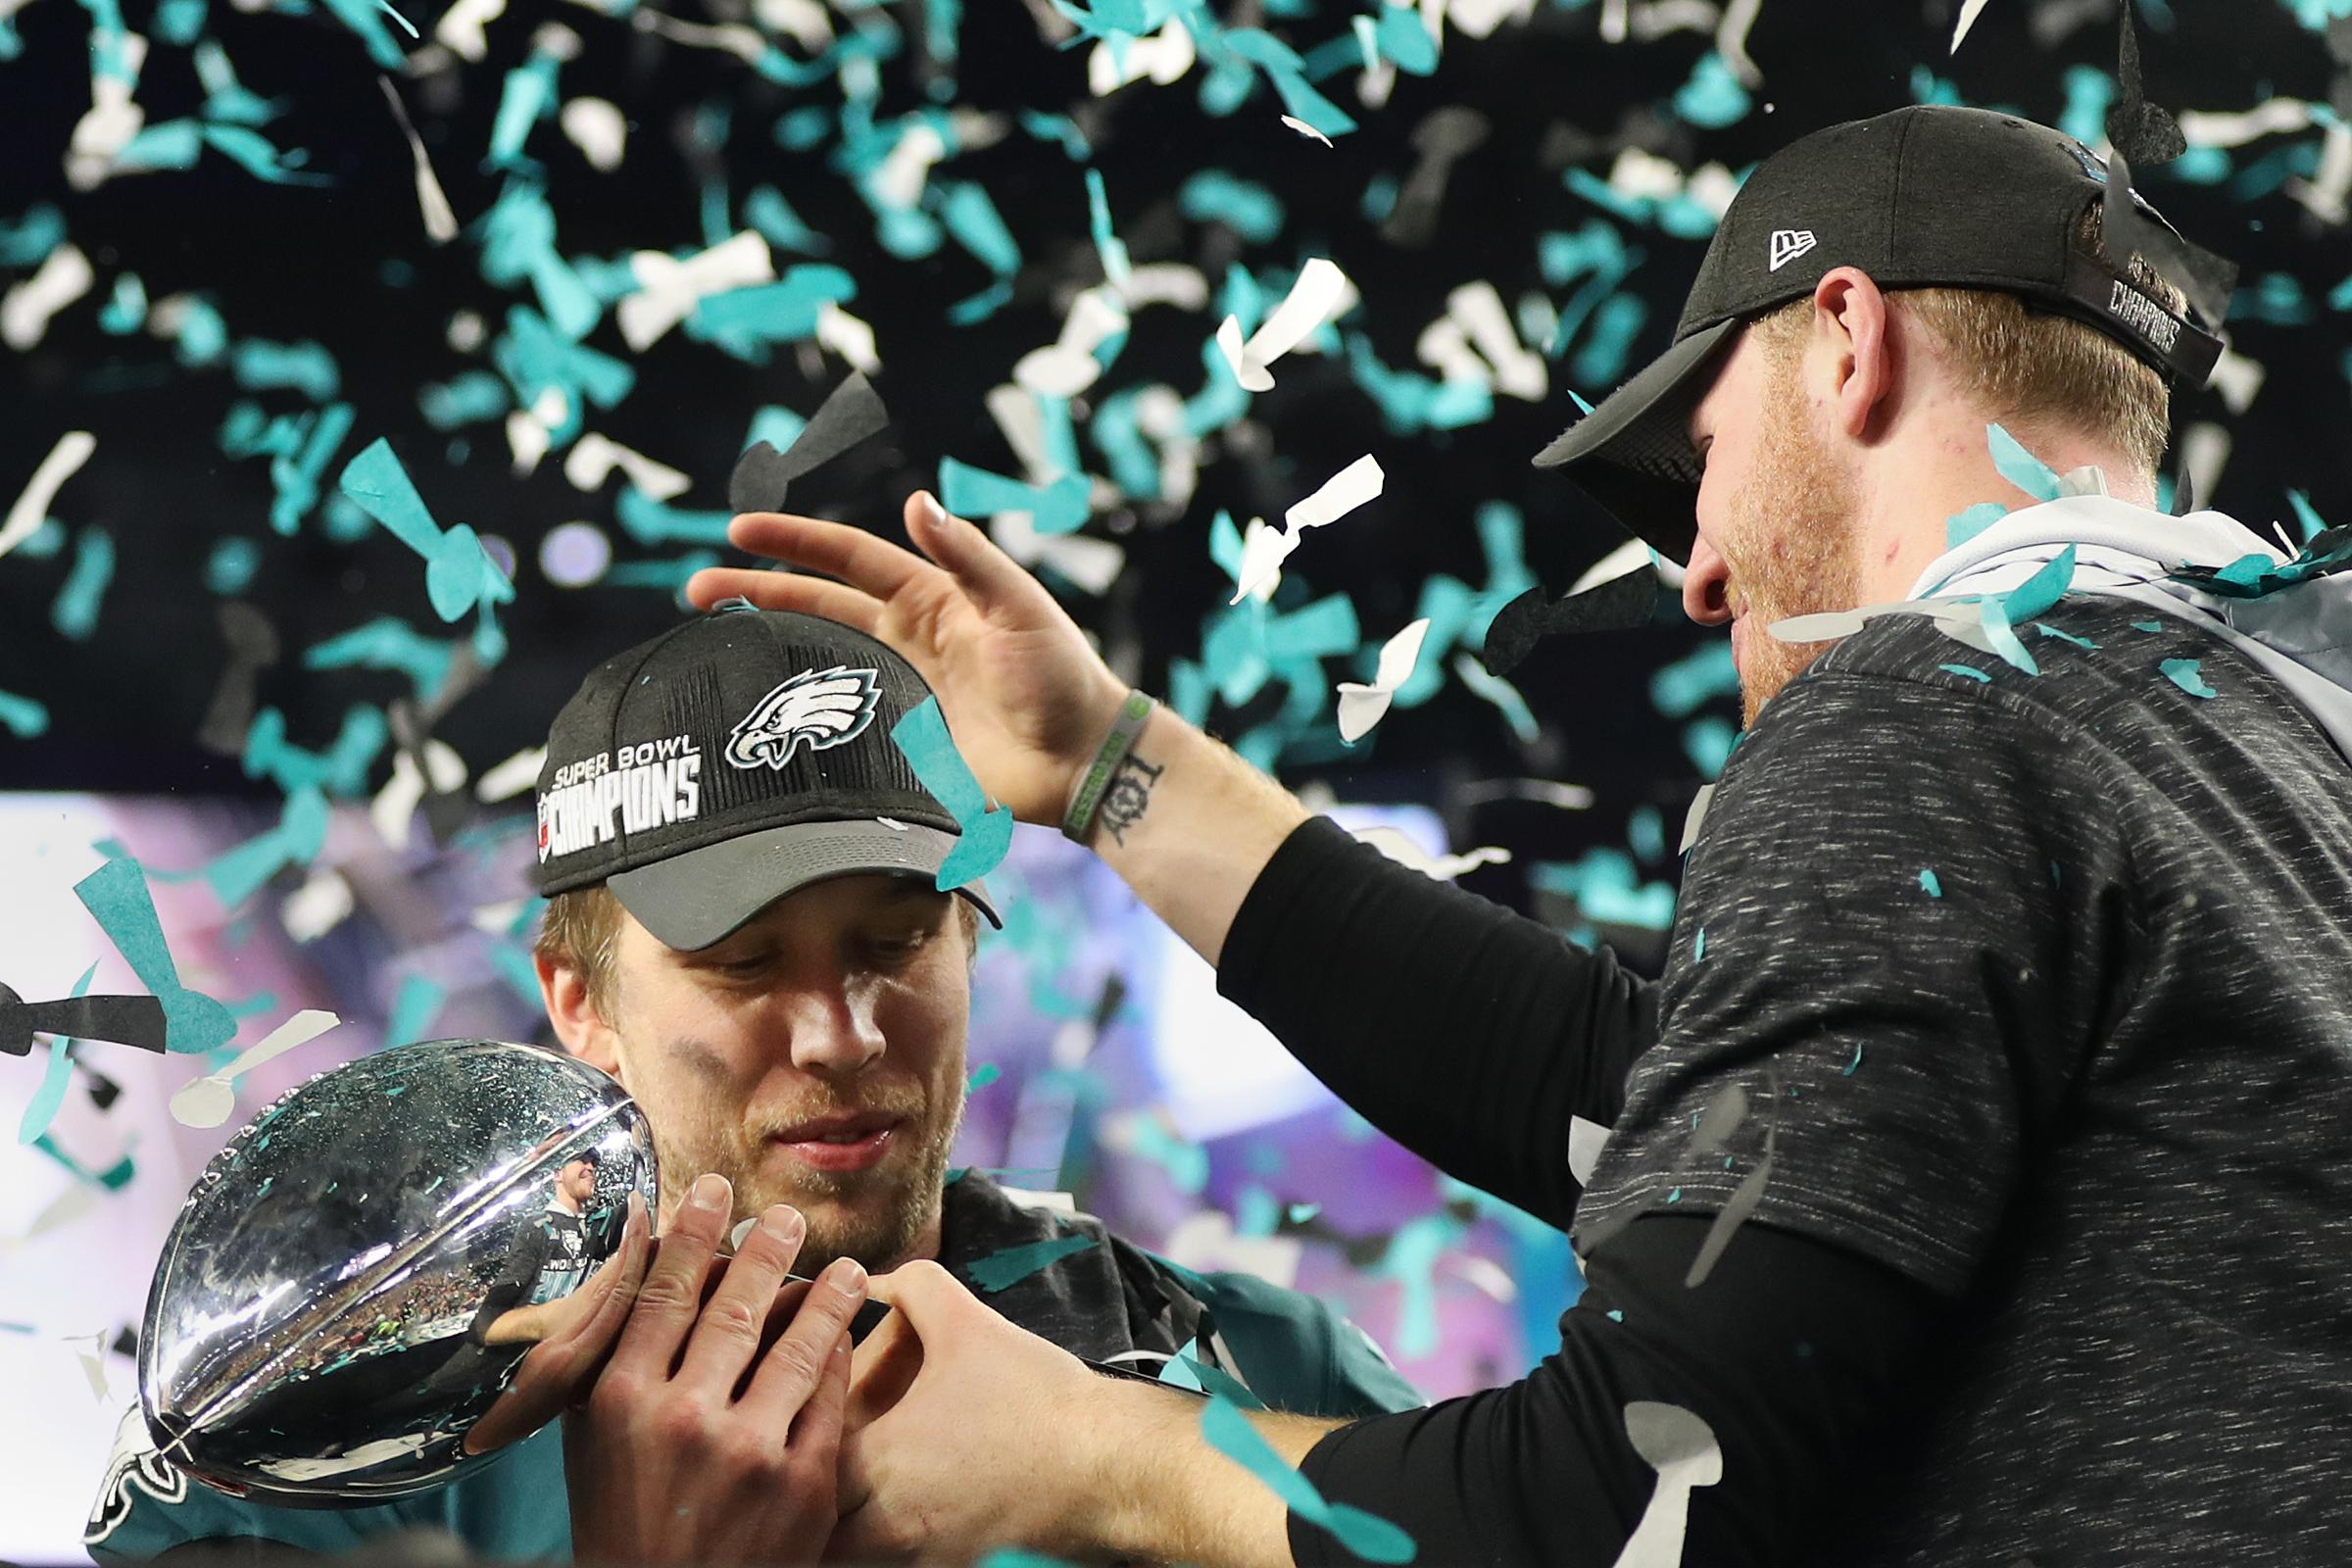 Eagles quarterback Nick Foles and injured quarterback Carson Wentz celebrate after Super Bowl LII, at U.S. Bank Stadium in Minneapolis, Minnesota, Sunday, Feb. 4, 2018. The Eagles won 41-33.